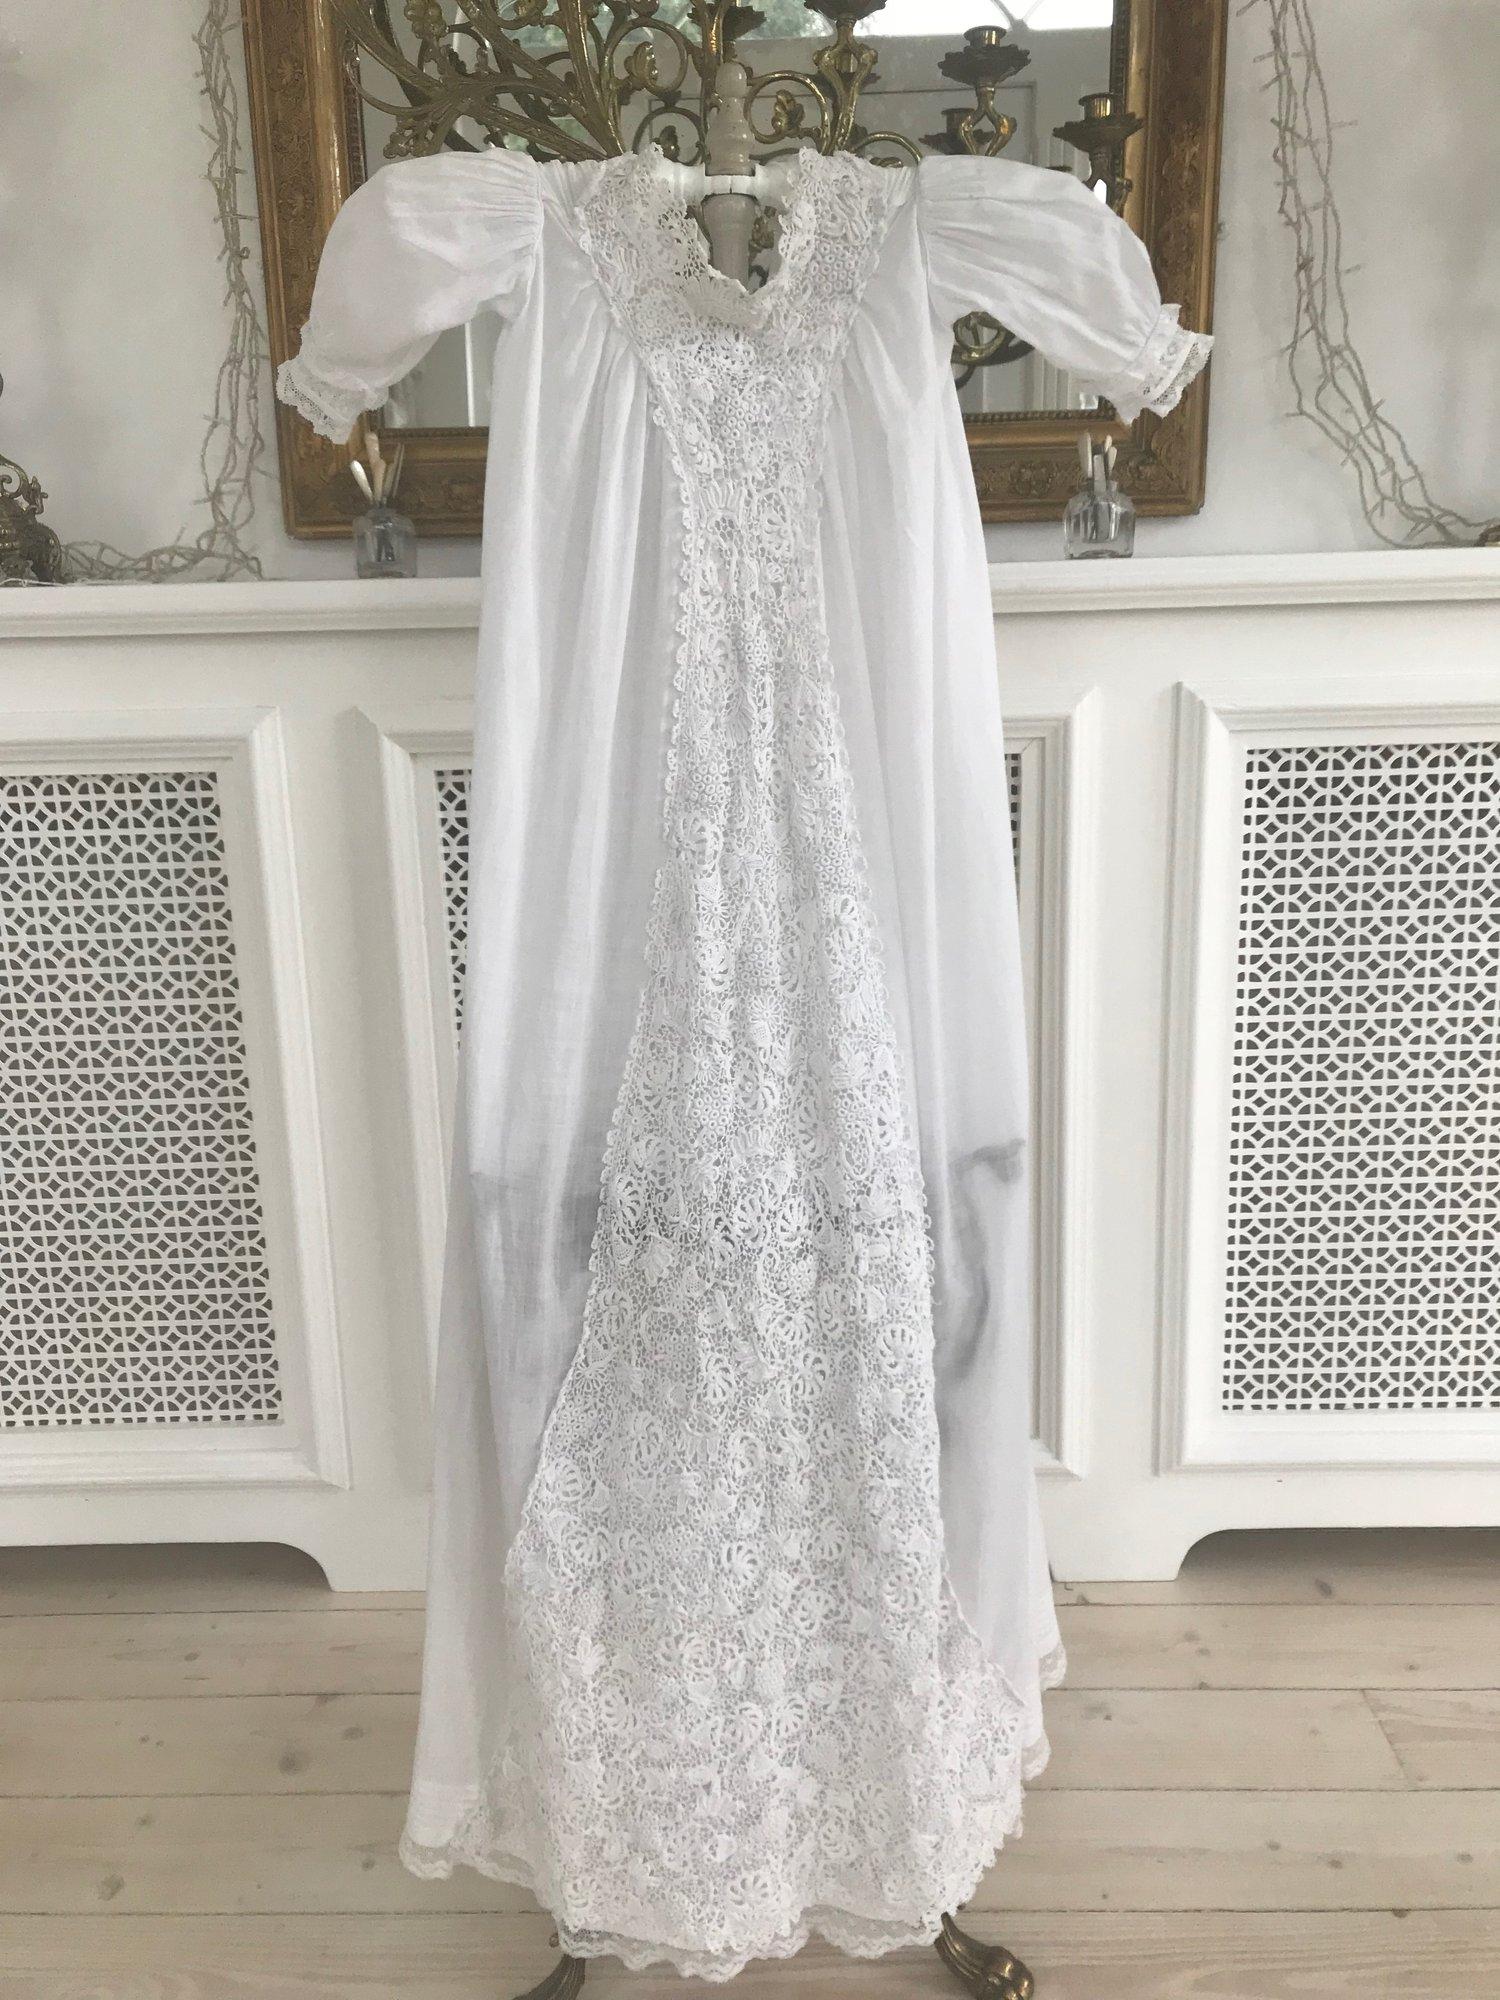 Antique Irish Crochet Lace Christening Gown Sheelin Lace